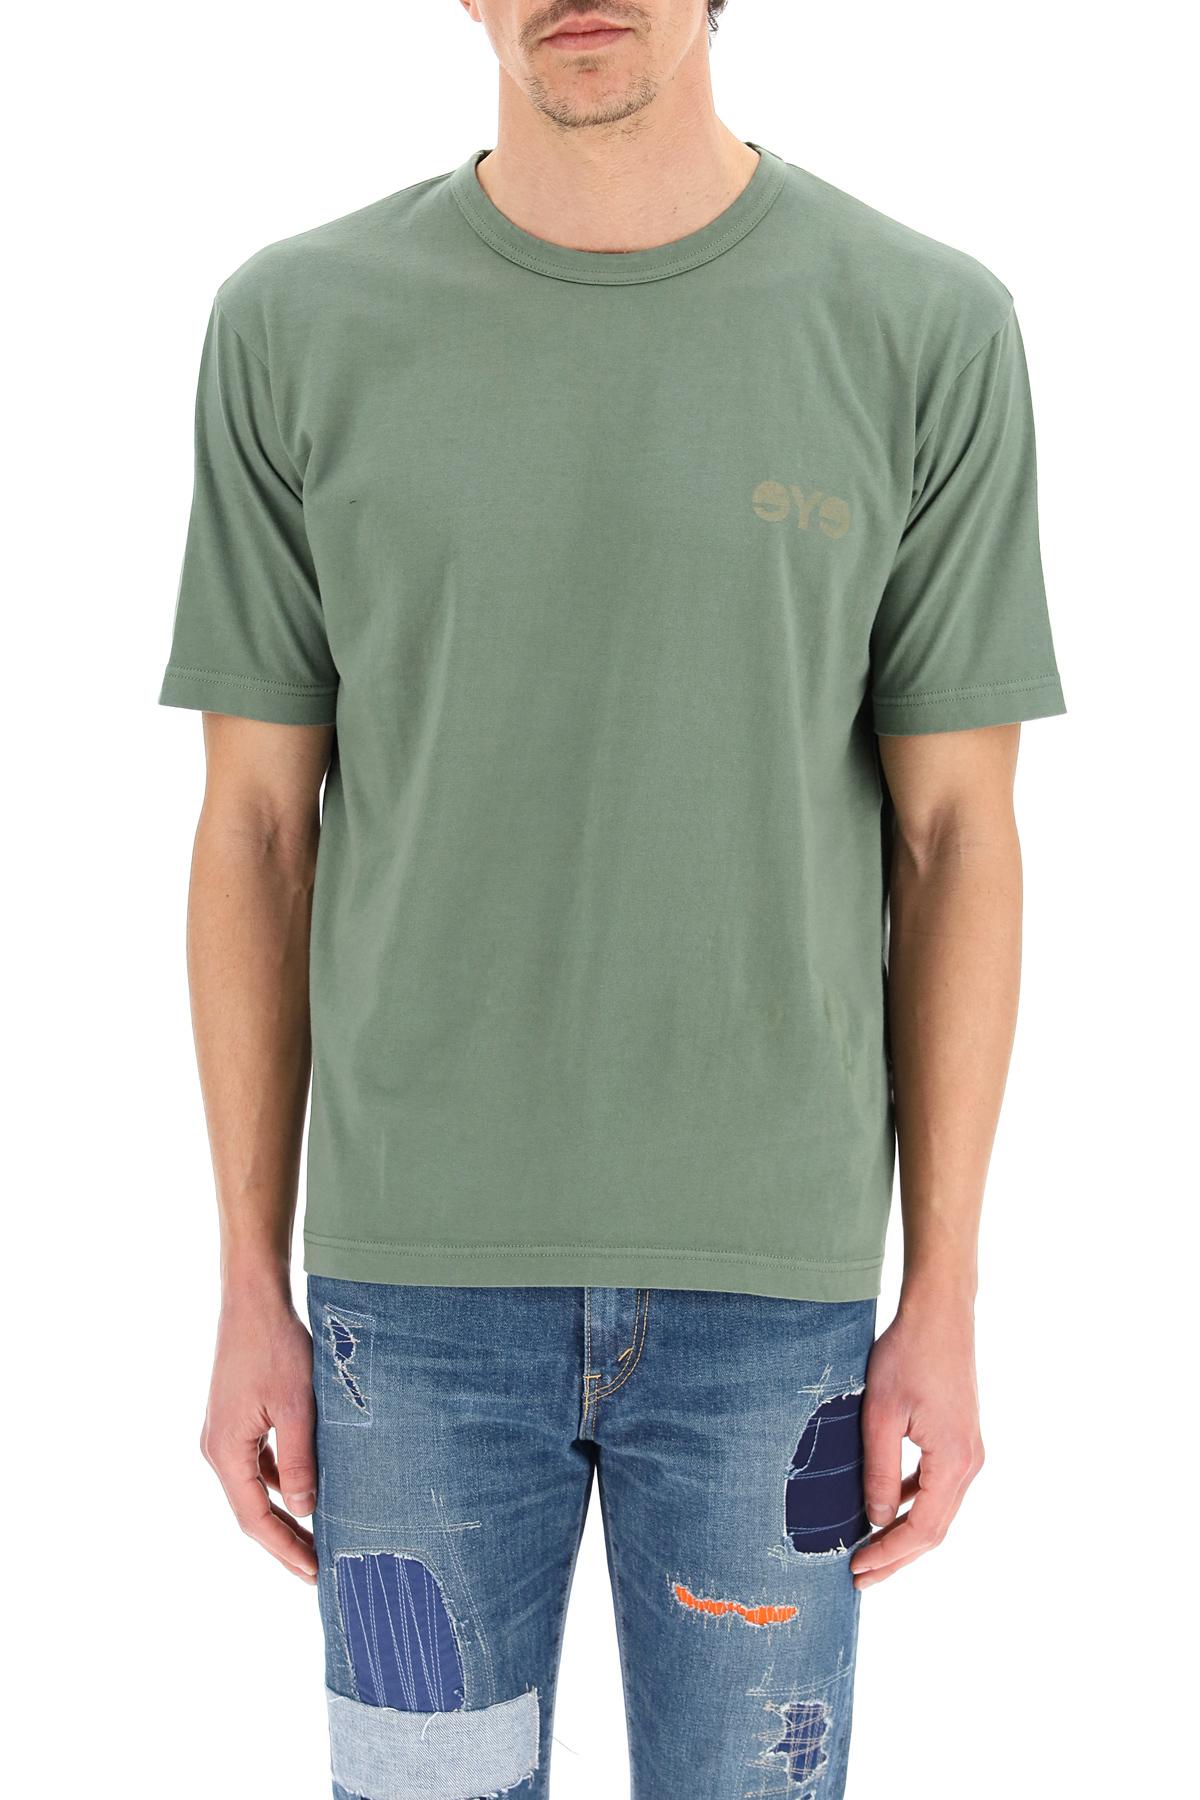 Junya watanabe t-shirt con stampa eye